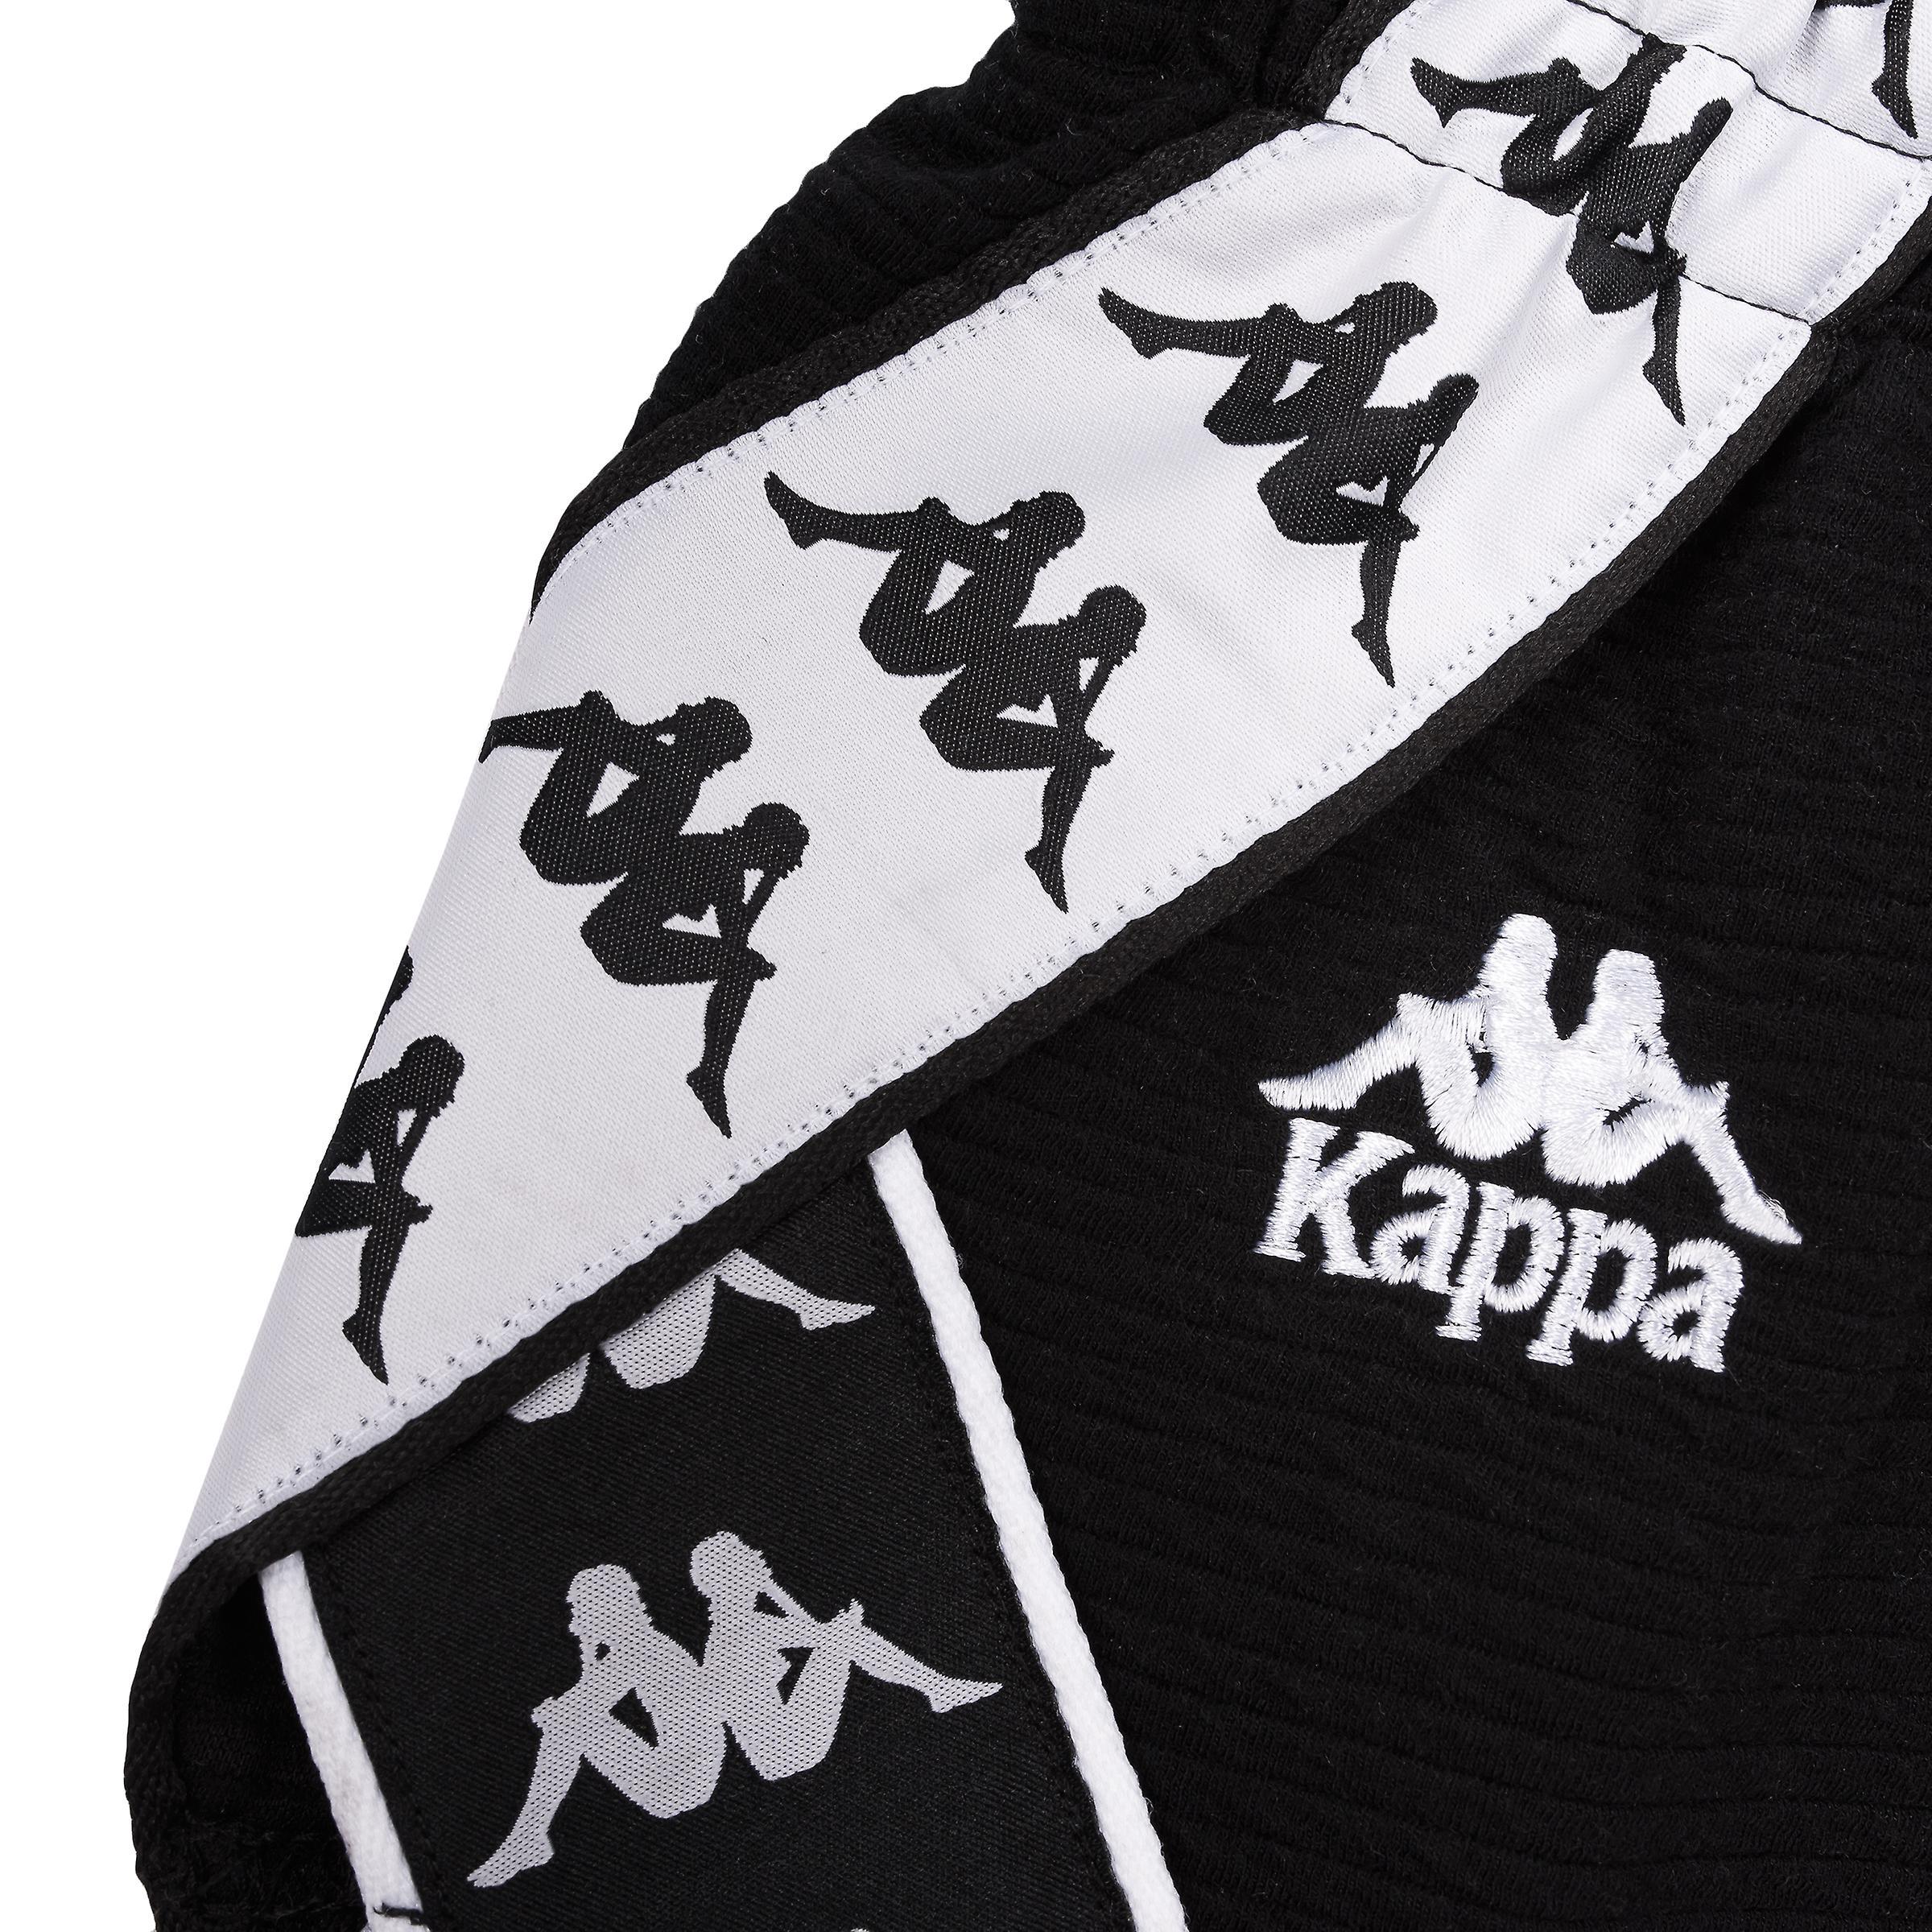 7d71263241 Kappa Women's Shorts 222 Banda Boula